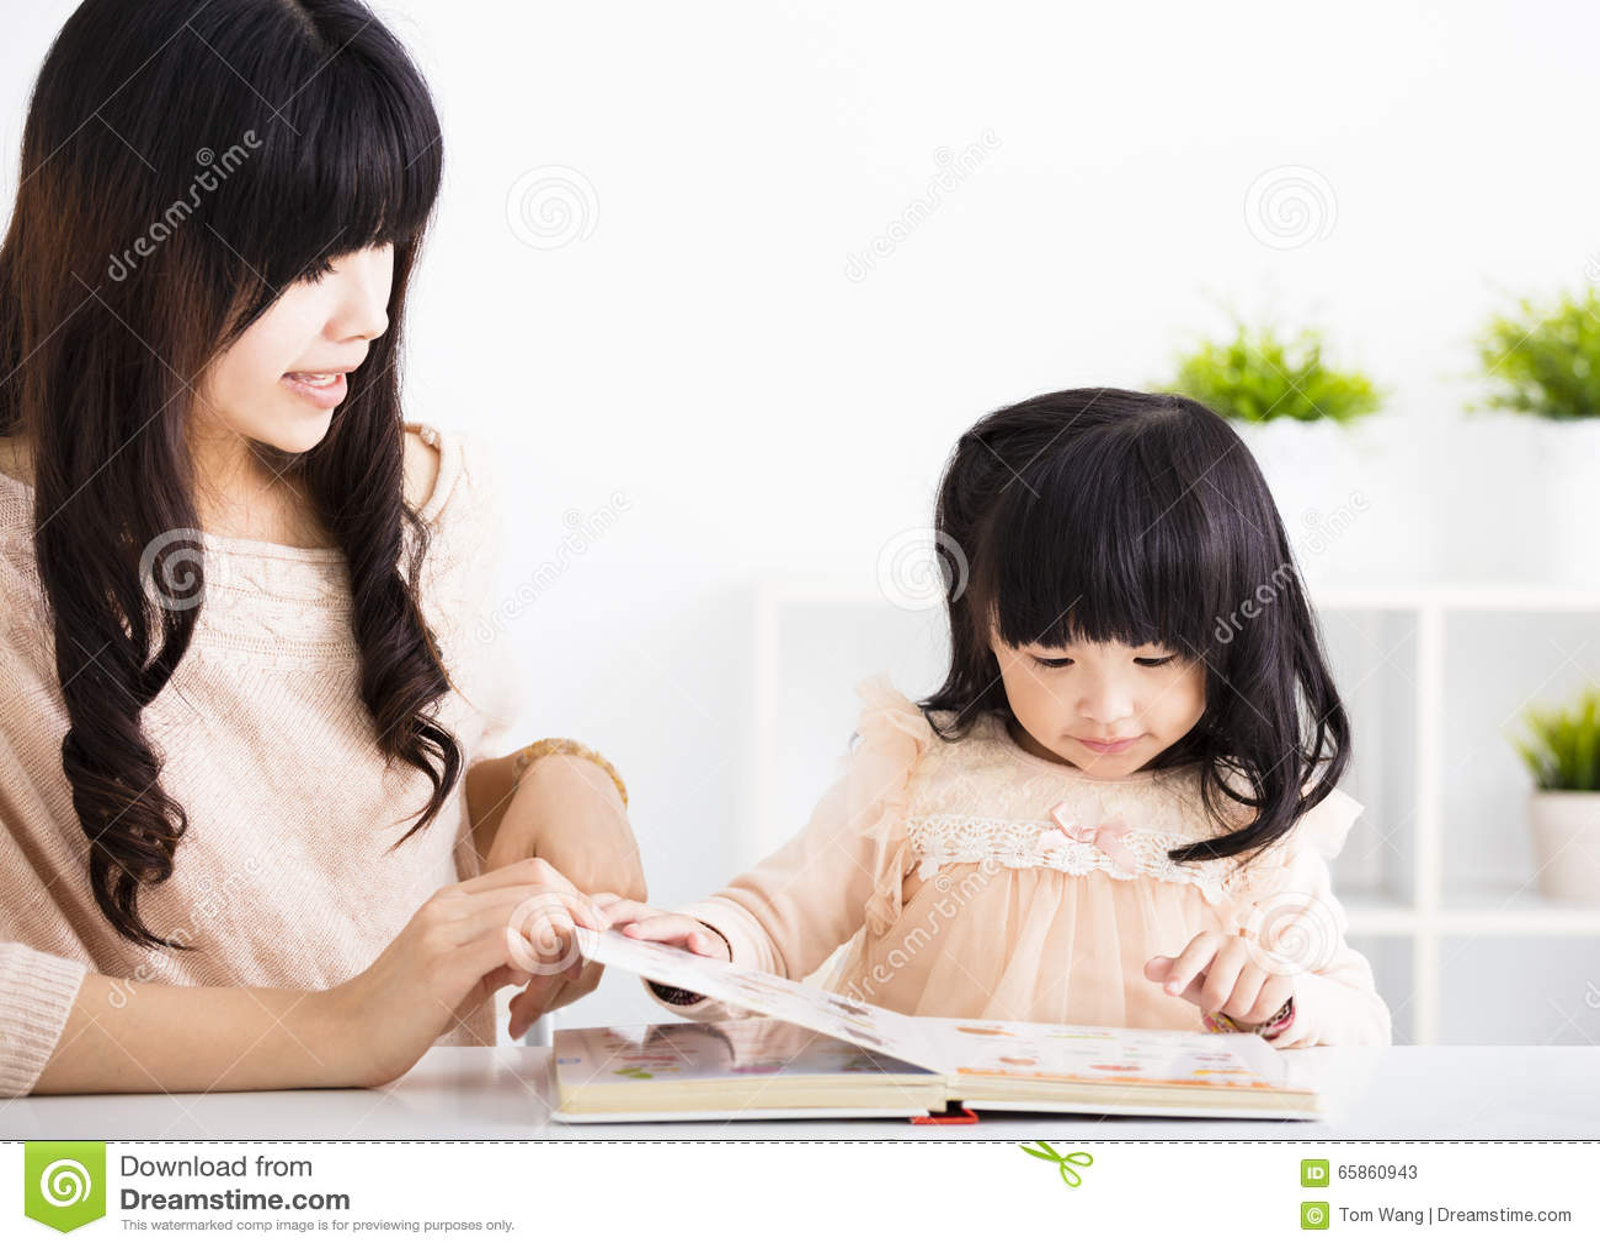 daughter asian escort reading